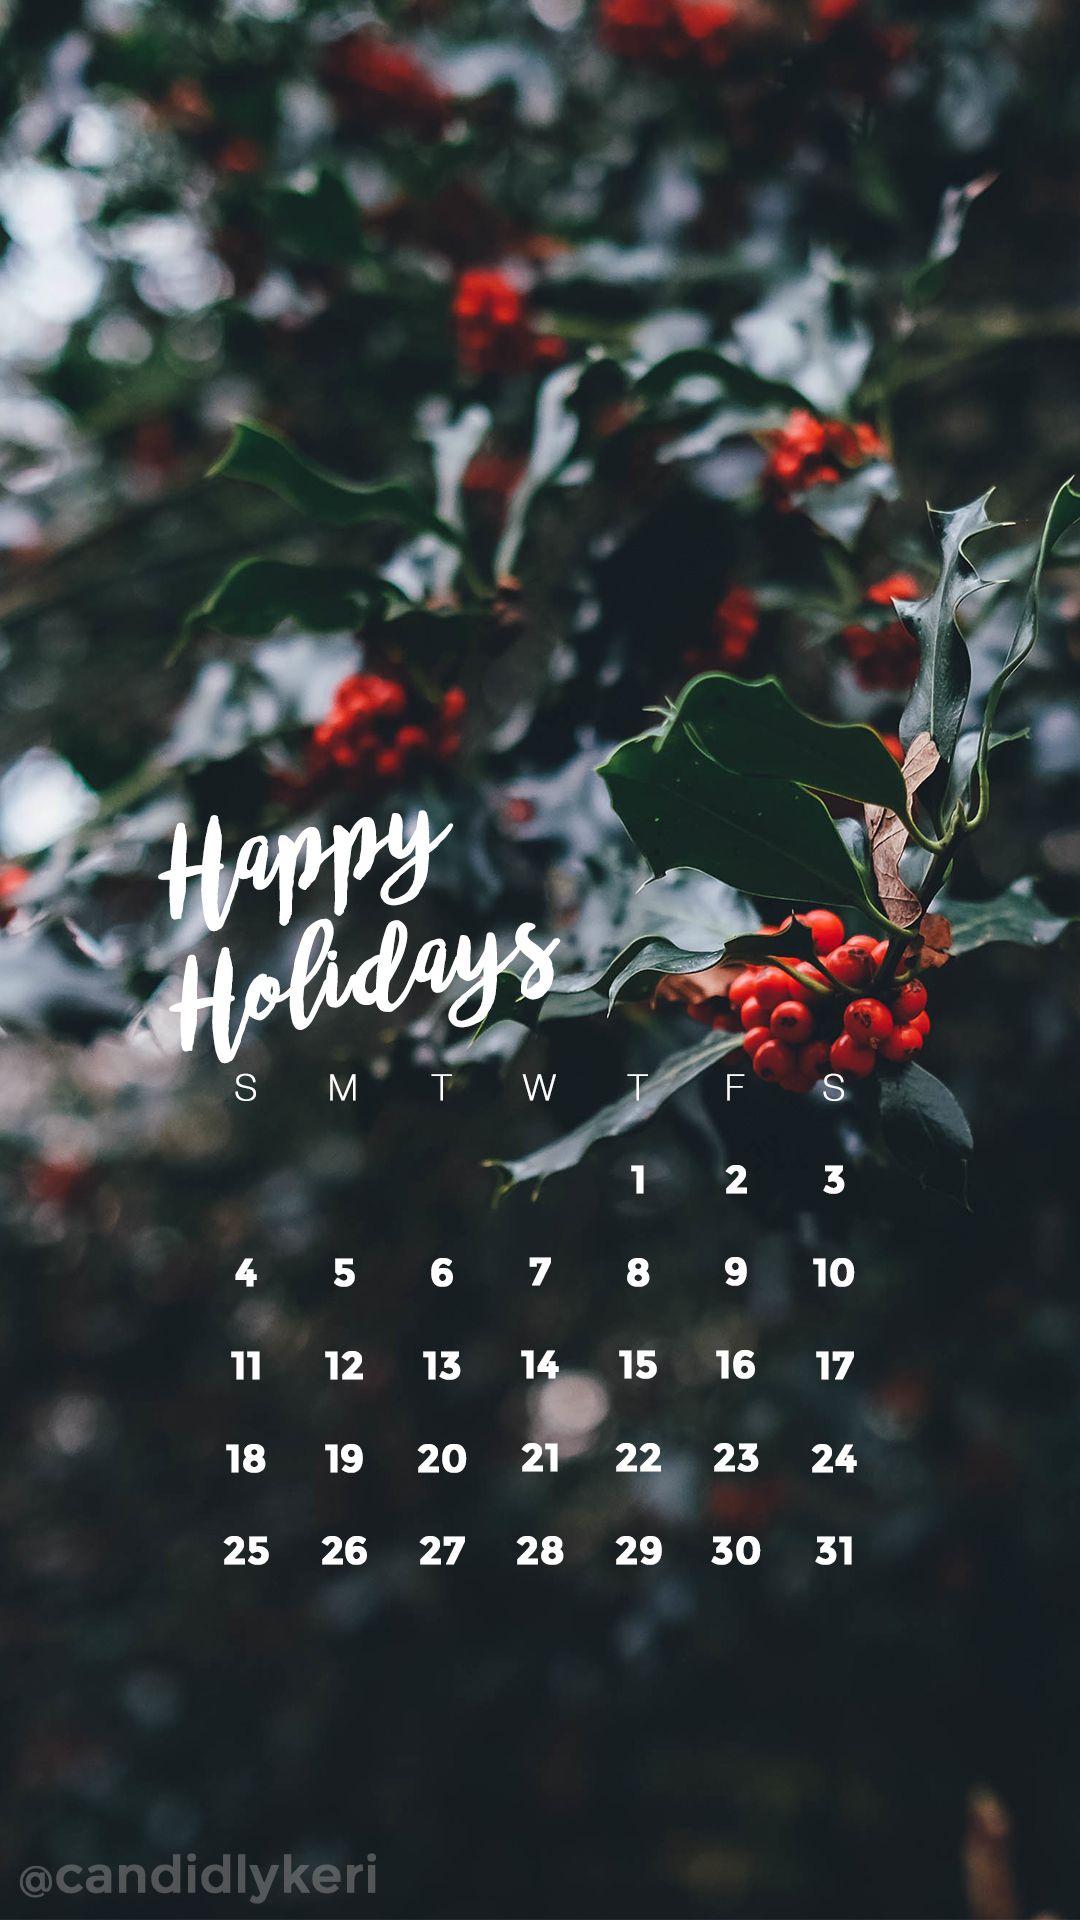 Happy Holiday's holly Christmas festive December calendar